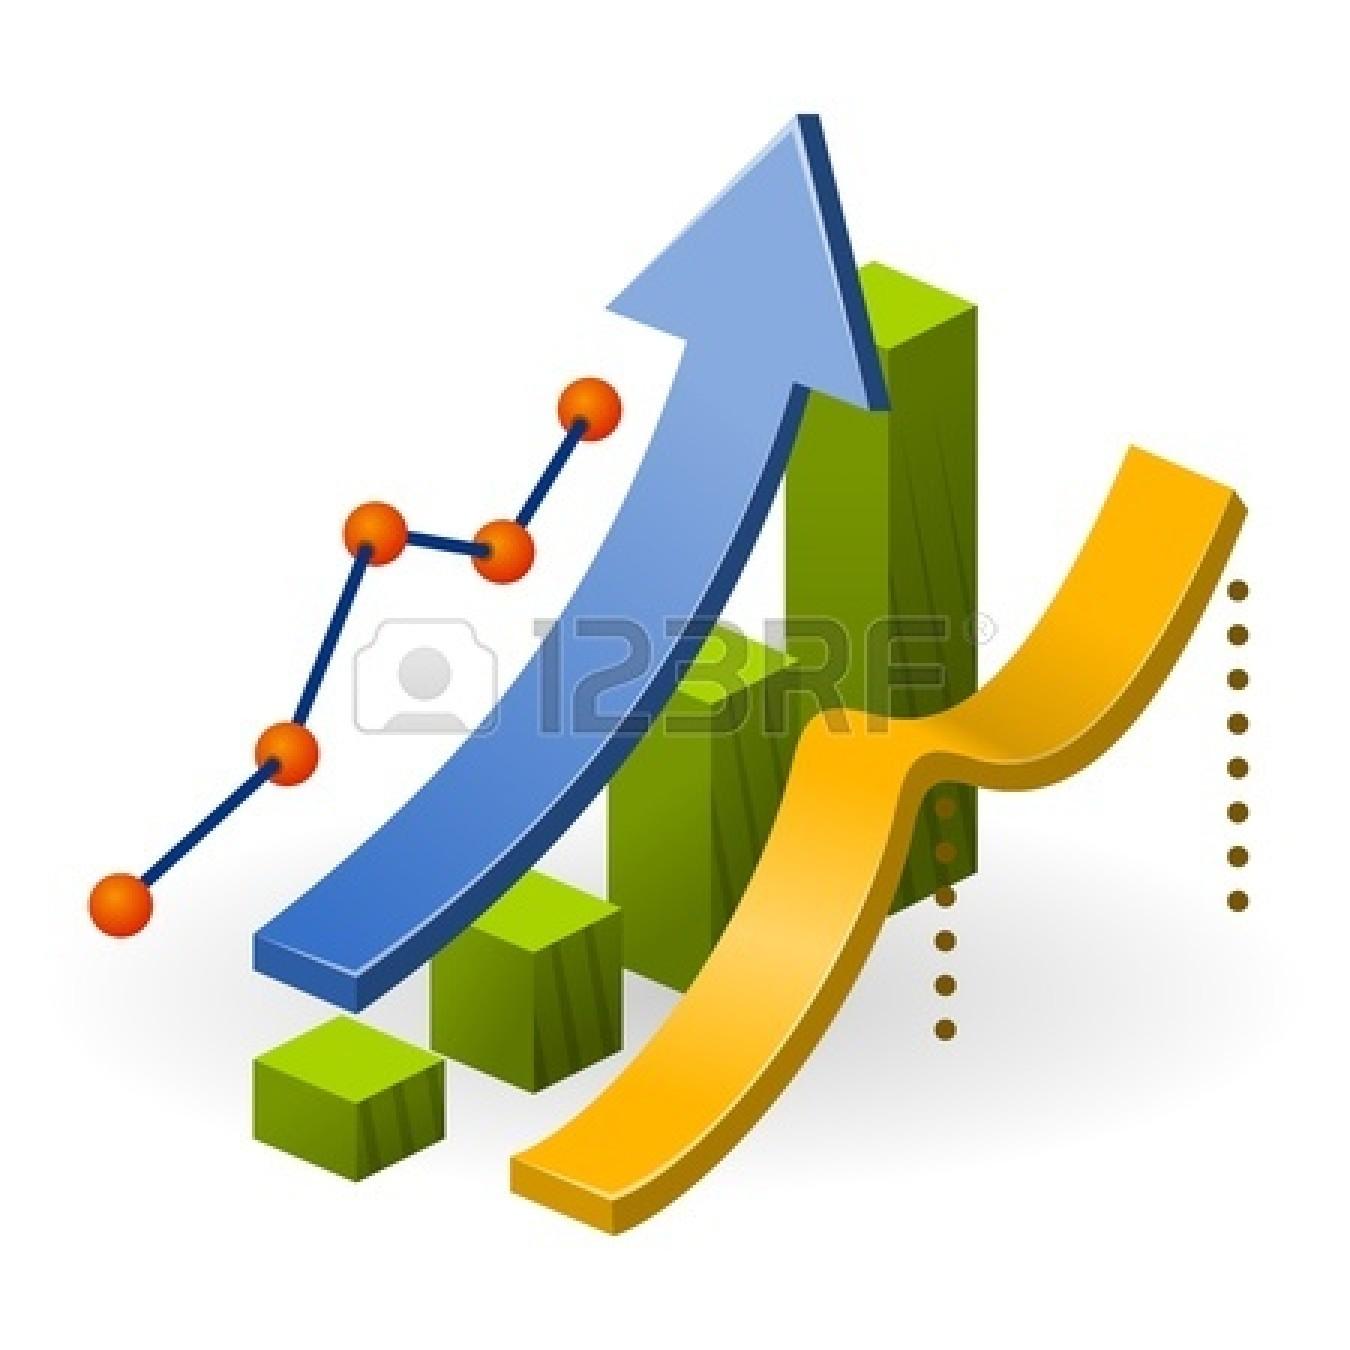 Analyze graph clipart free clip art freeuse stock Analysis Clipart   Clipart Panda - Free Clipart Images clip art freeuse stock